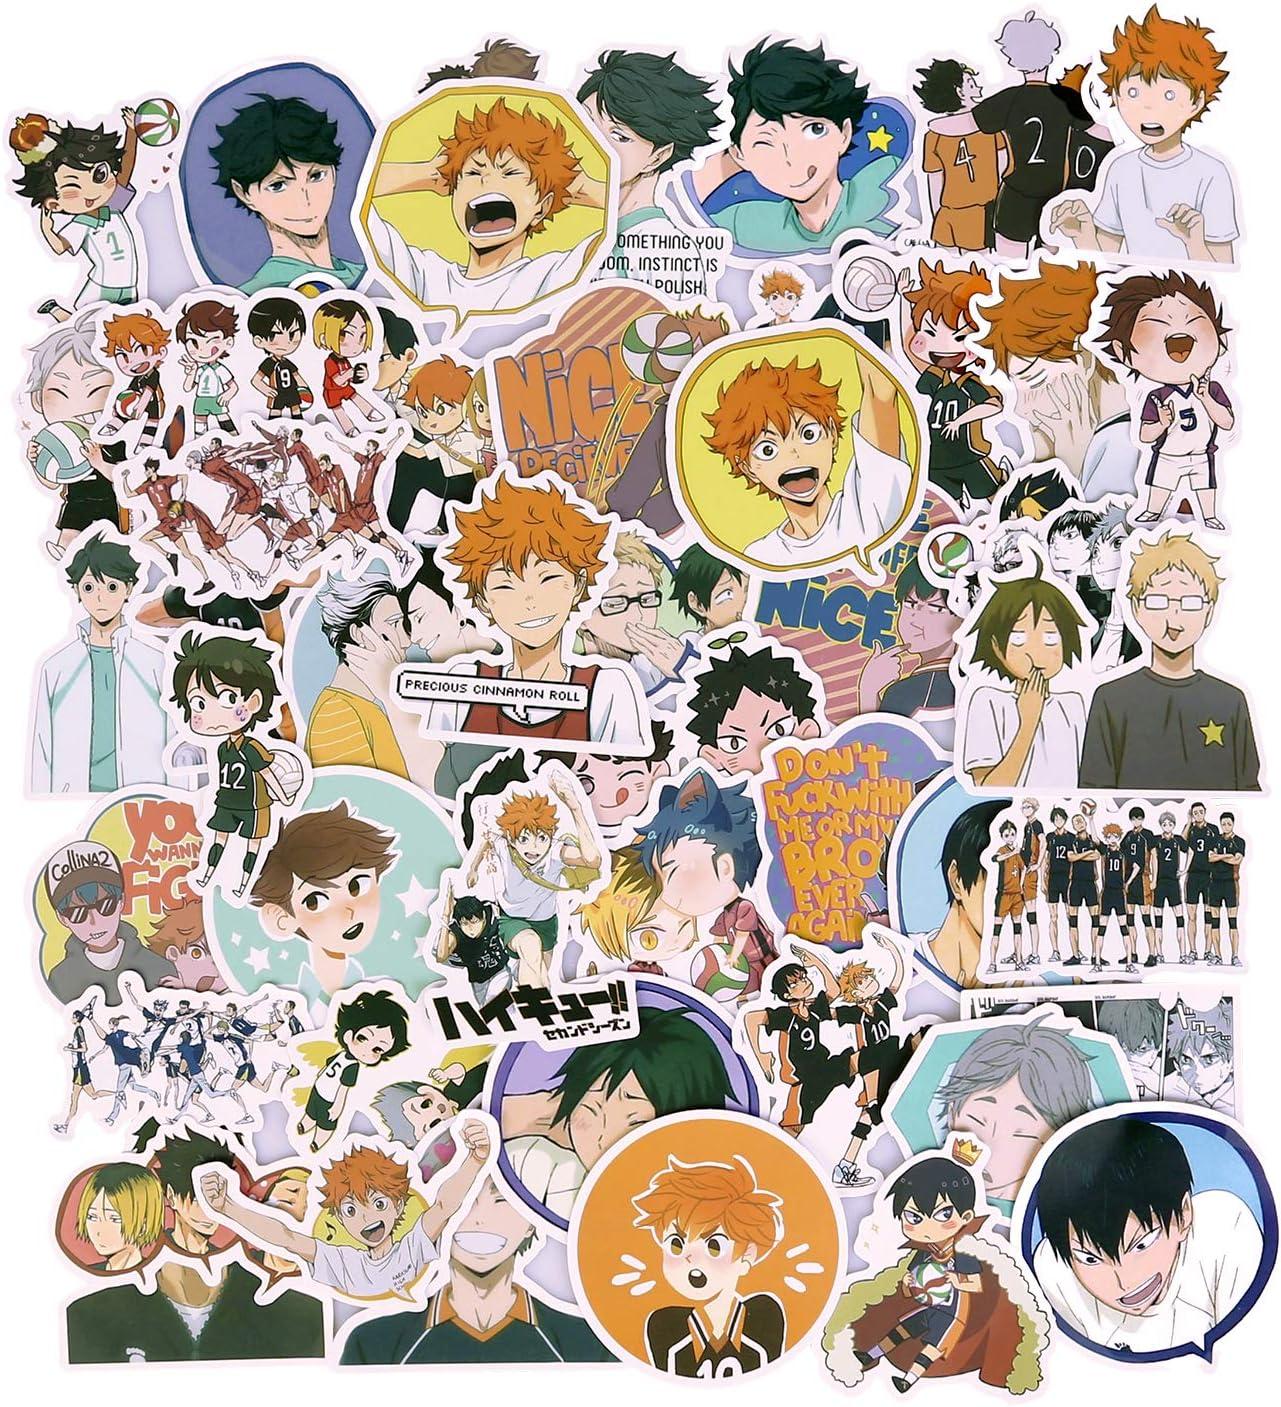 Haikyuu Stickers, Anime Stickers Waterproof Vinyl Stickers Laptop Stickers Skateboard Stickers for Teens Water Bottle Stickers Bike Bumper Luggage Graffiti Decals(50pcs)